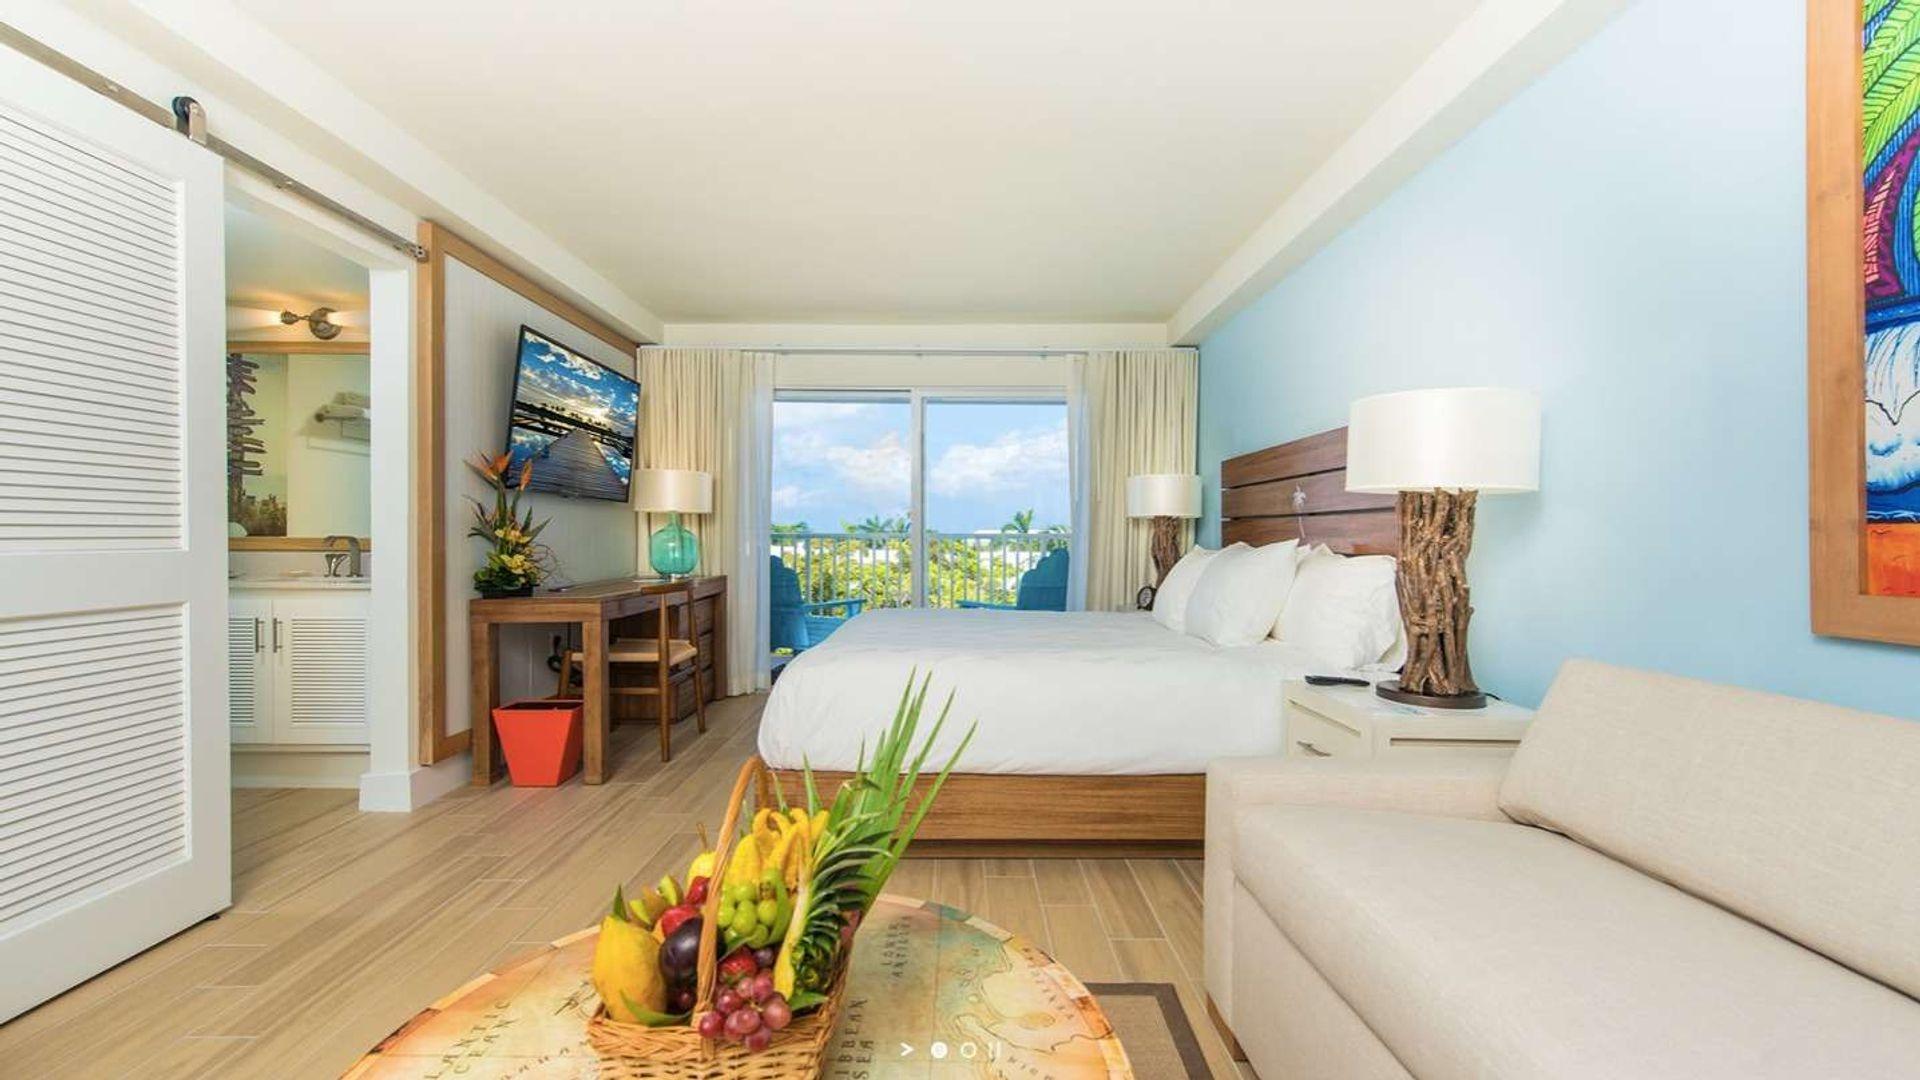 Margaritaville ( former name ) Top Floor Extended Suite